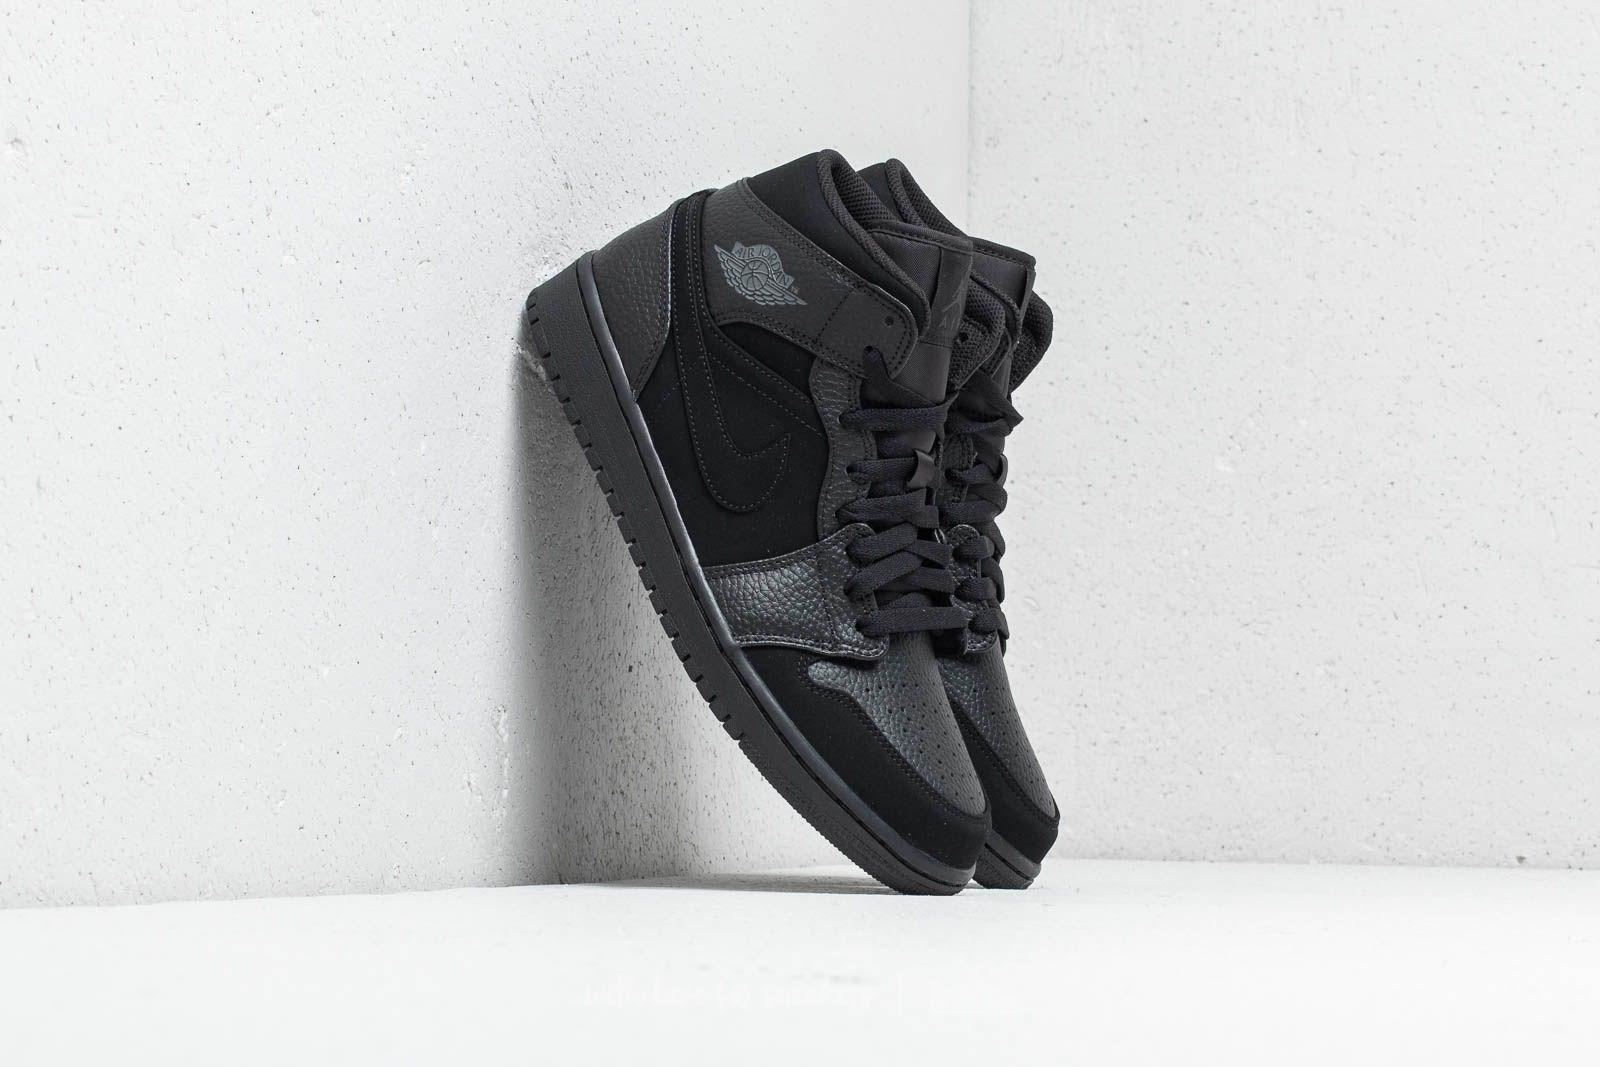 Pánské kotníkové boty Air Jordan 1 Mid Black/ Dark Smoke Grey-Black